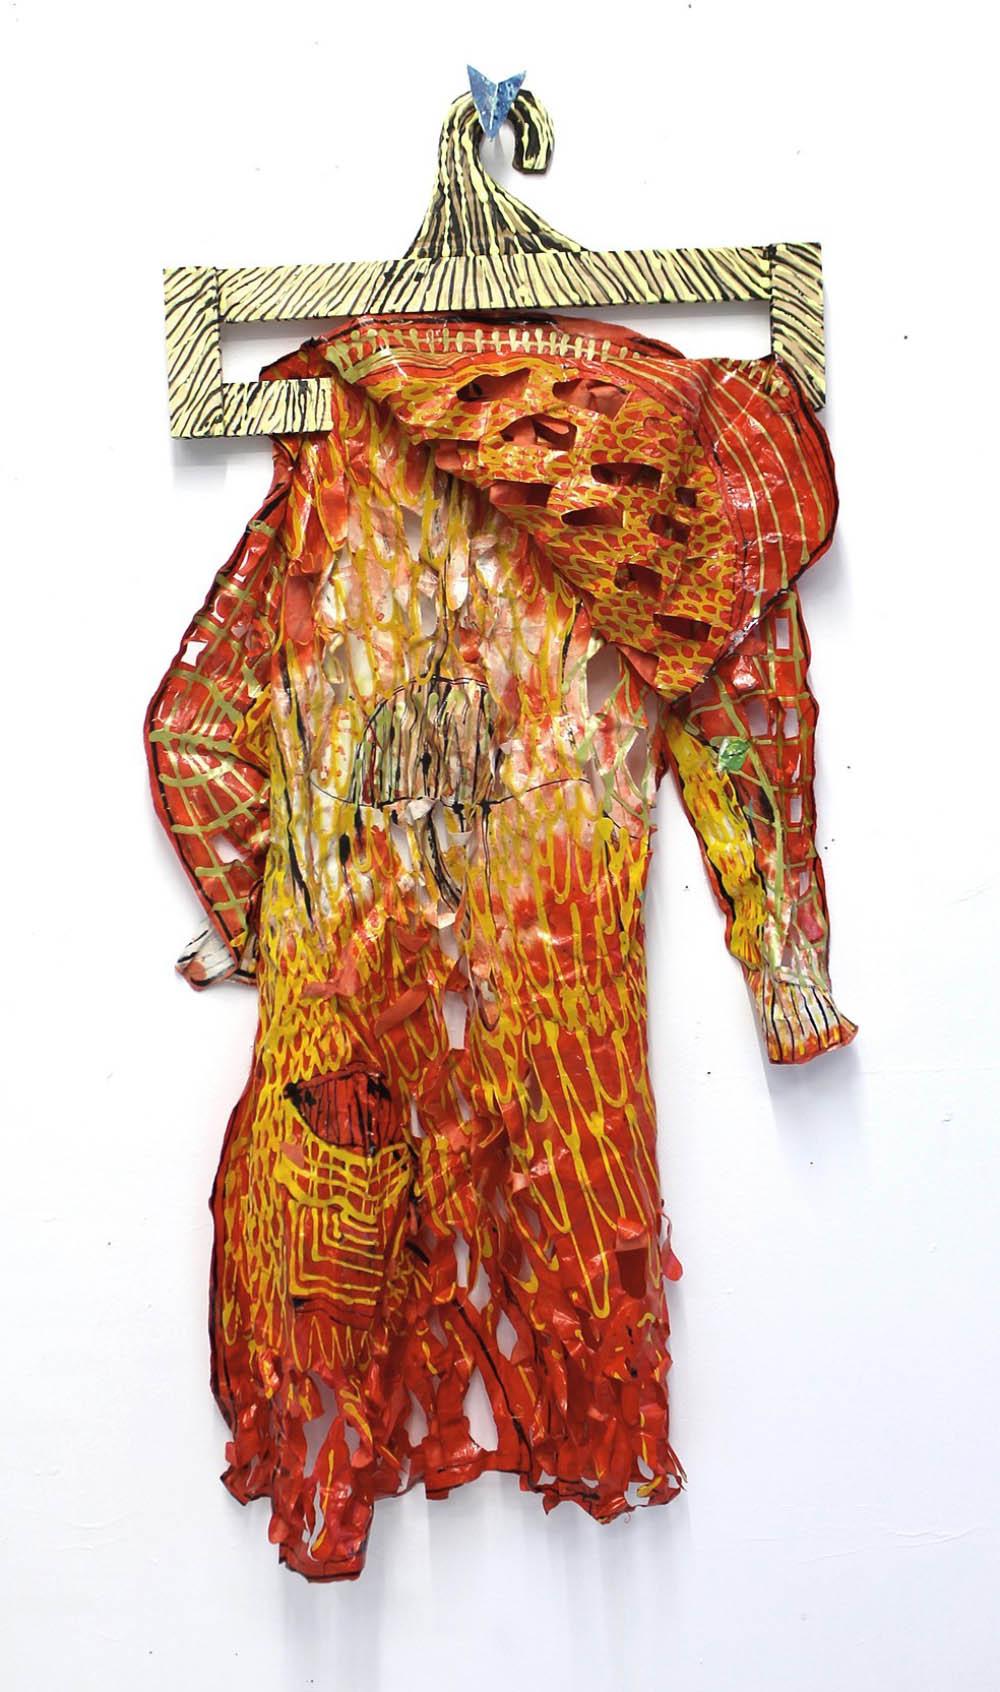 "Raincoat, 2014, acrylic, ink and fabric dye on Japanese Okawara paper, 48"" x 30"""